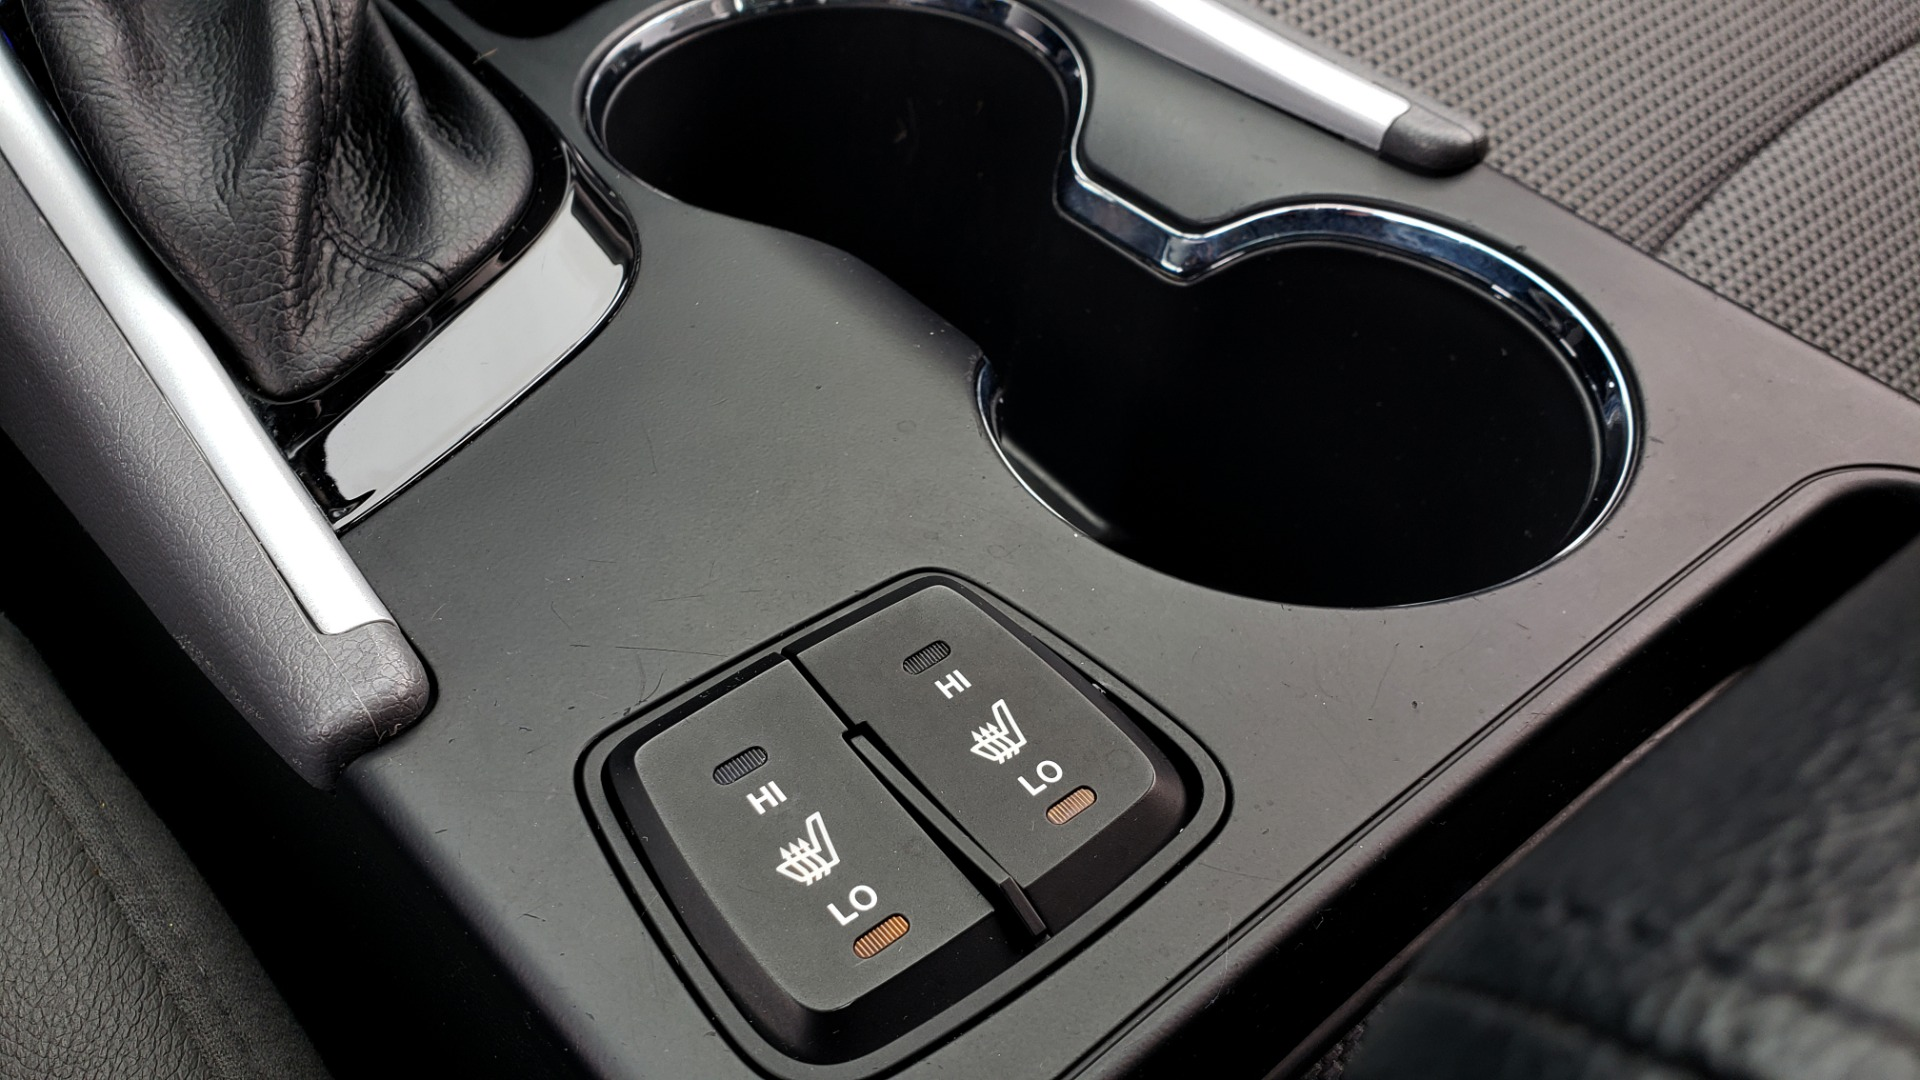 Used 2013 Hyundai SONATA SE AUTO / 2.4L 4-CYL / 6-SPD AUTO / VERY CLEAN for sale Sold at Formula Imports in Charlotte NC 28227 46